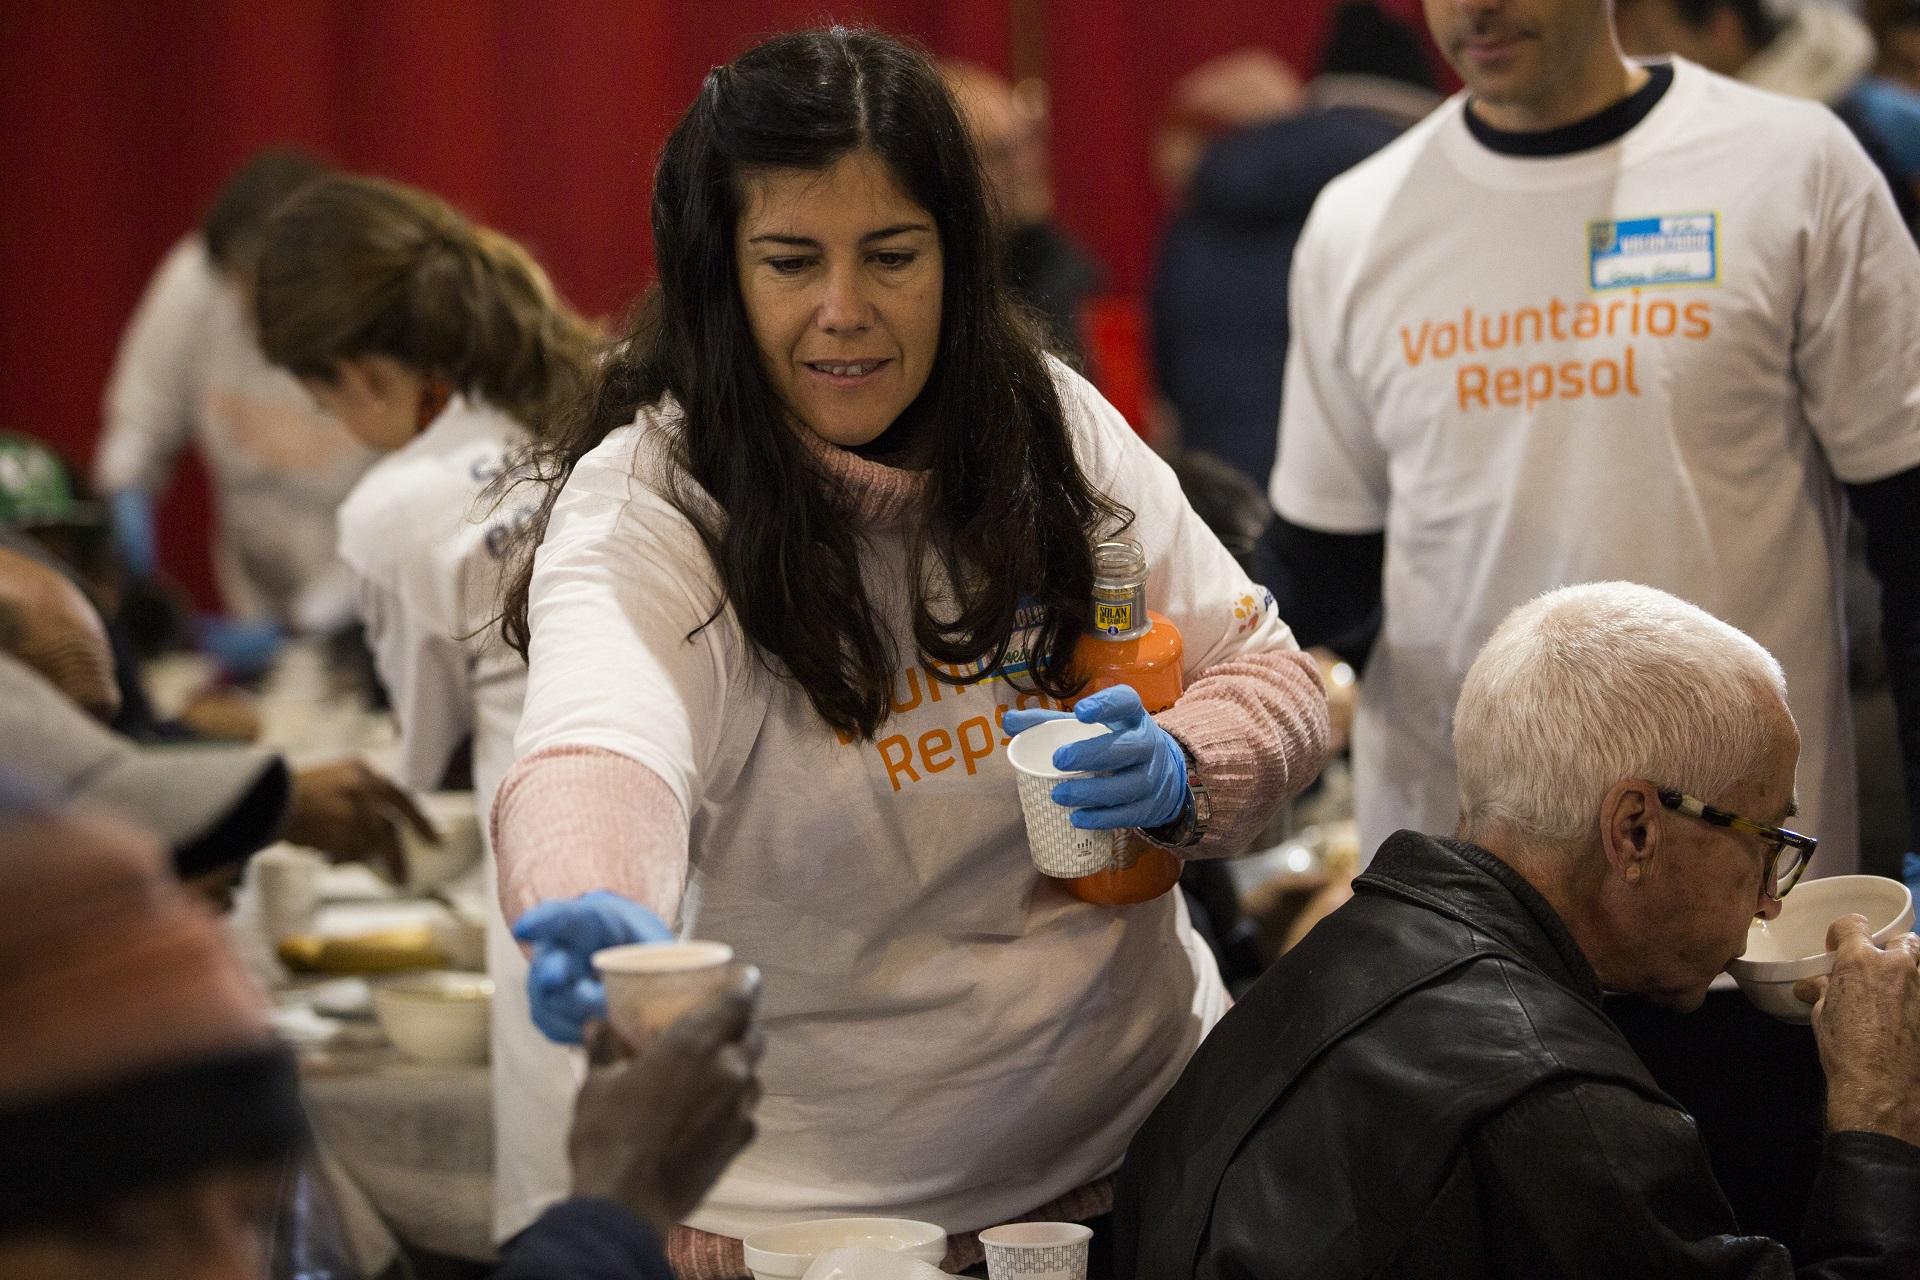 Semana Internacional Voluntariado Repsol Mensajeros Paz